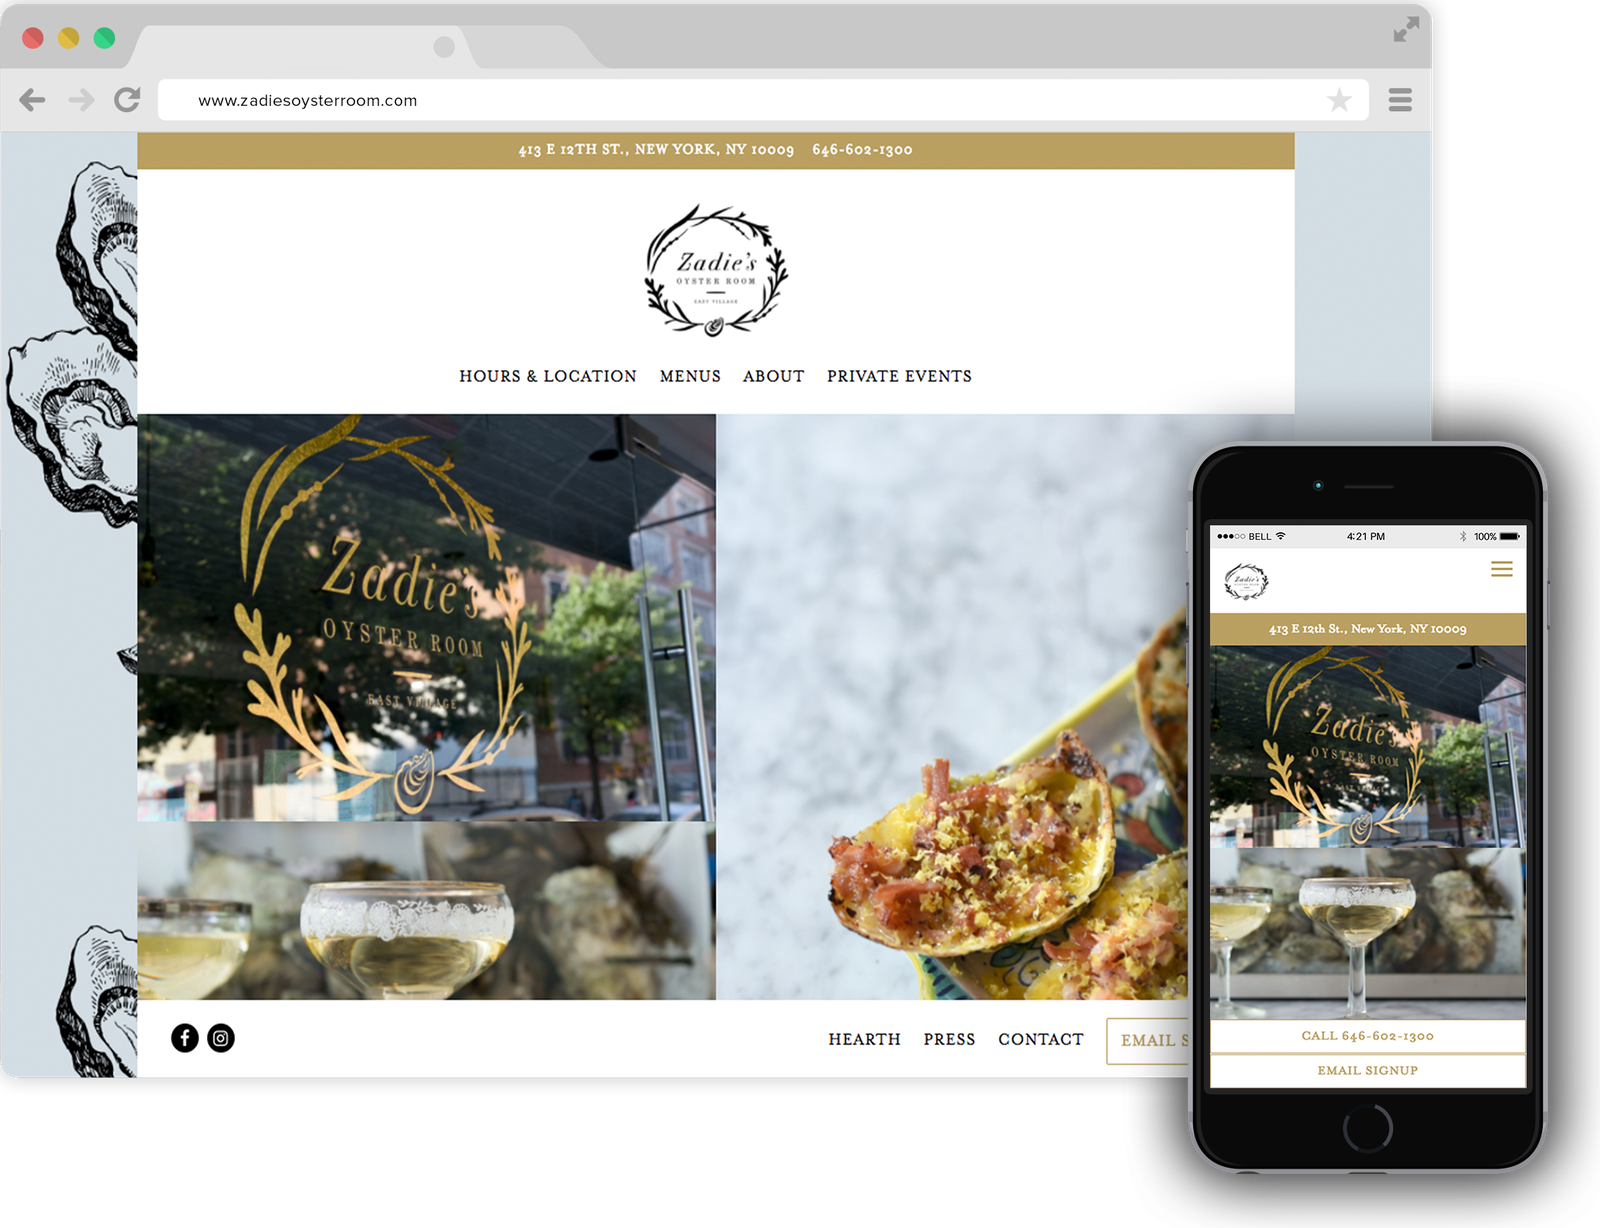 Zadie's Oyster Room Restaurant Website